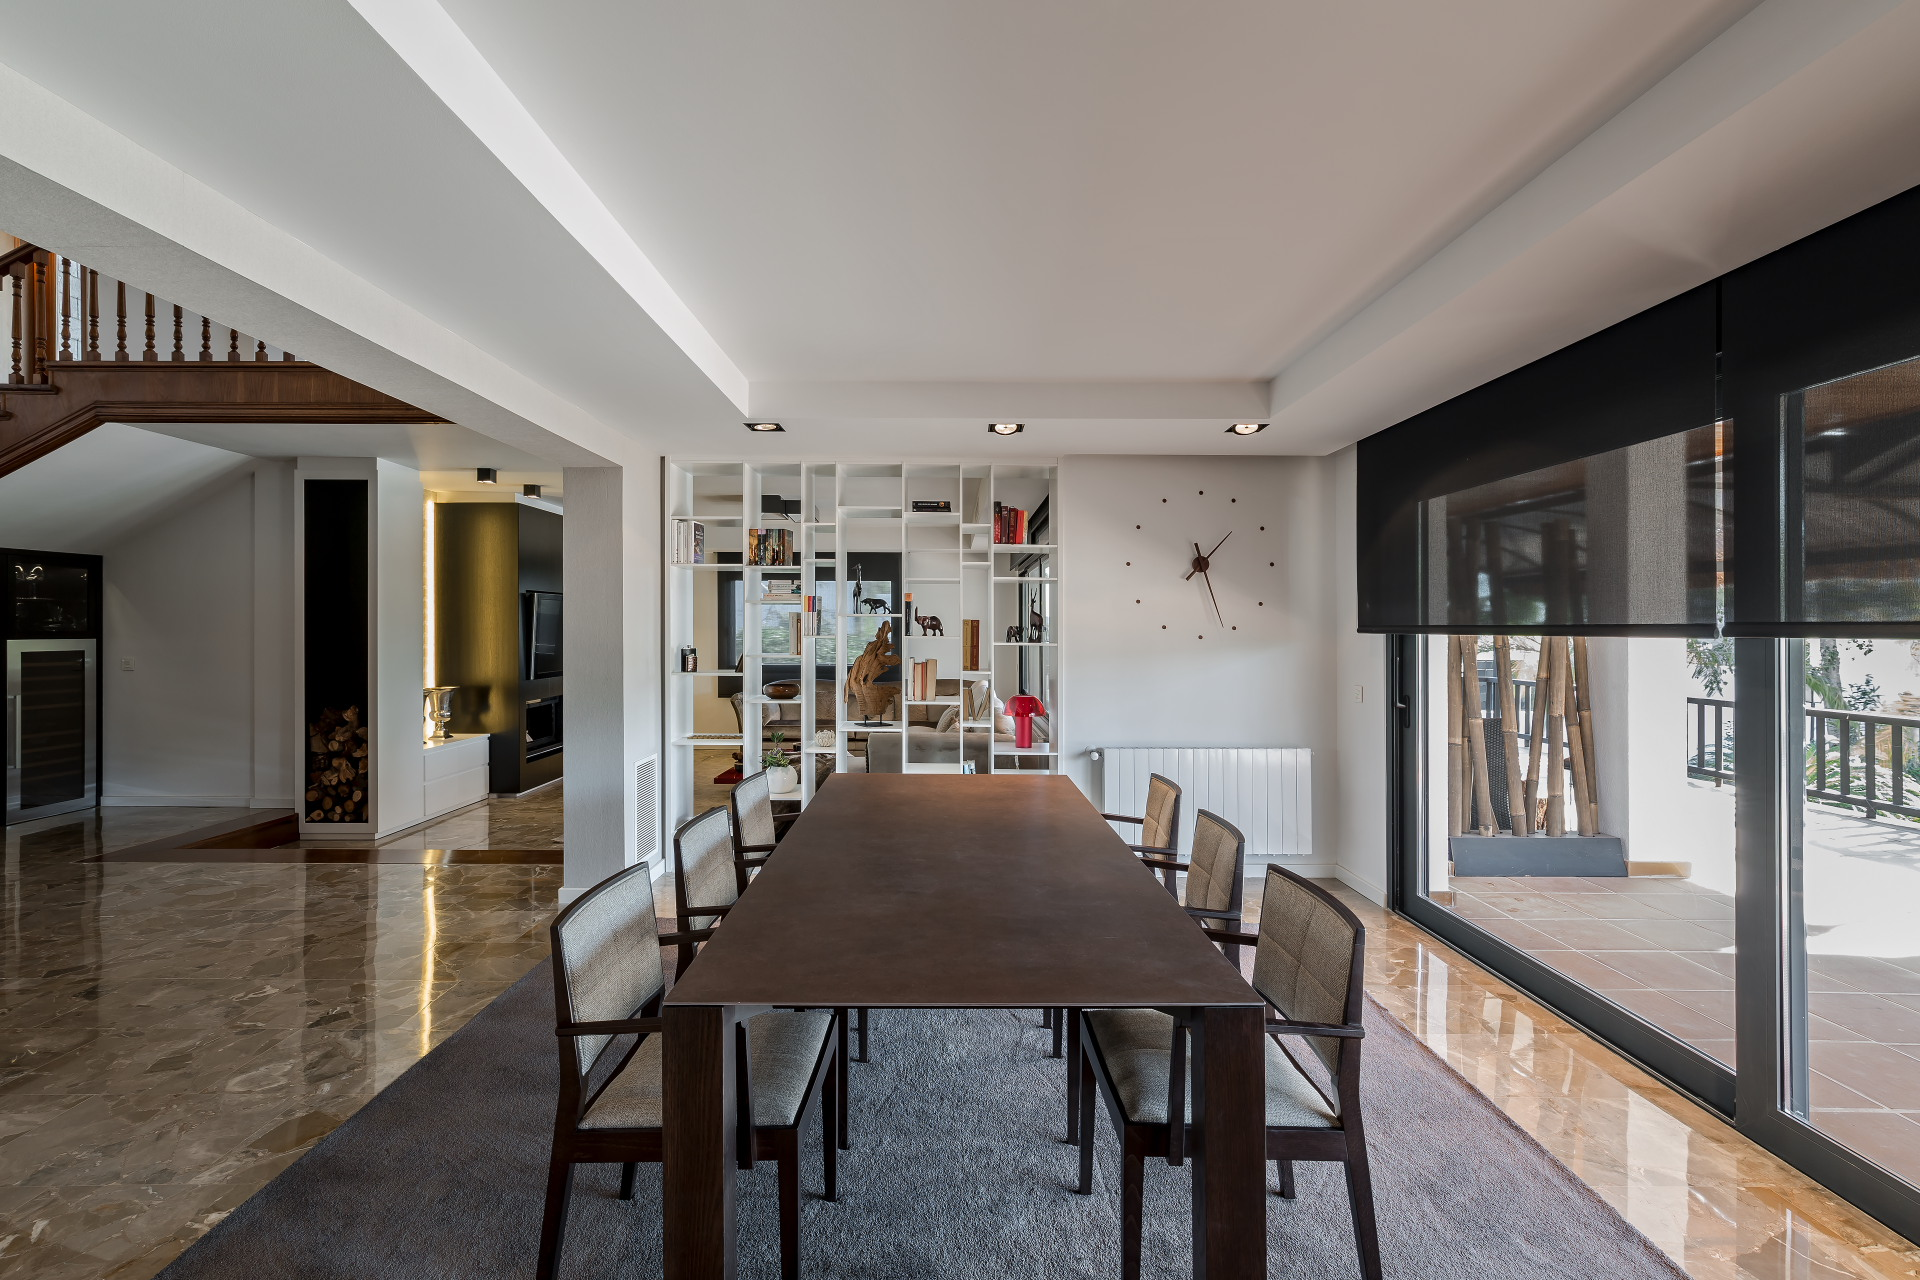 fotografia-arquitectura-valencia-german-cabo-laura_yerpes_canyada (7)